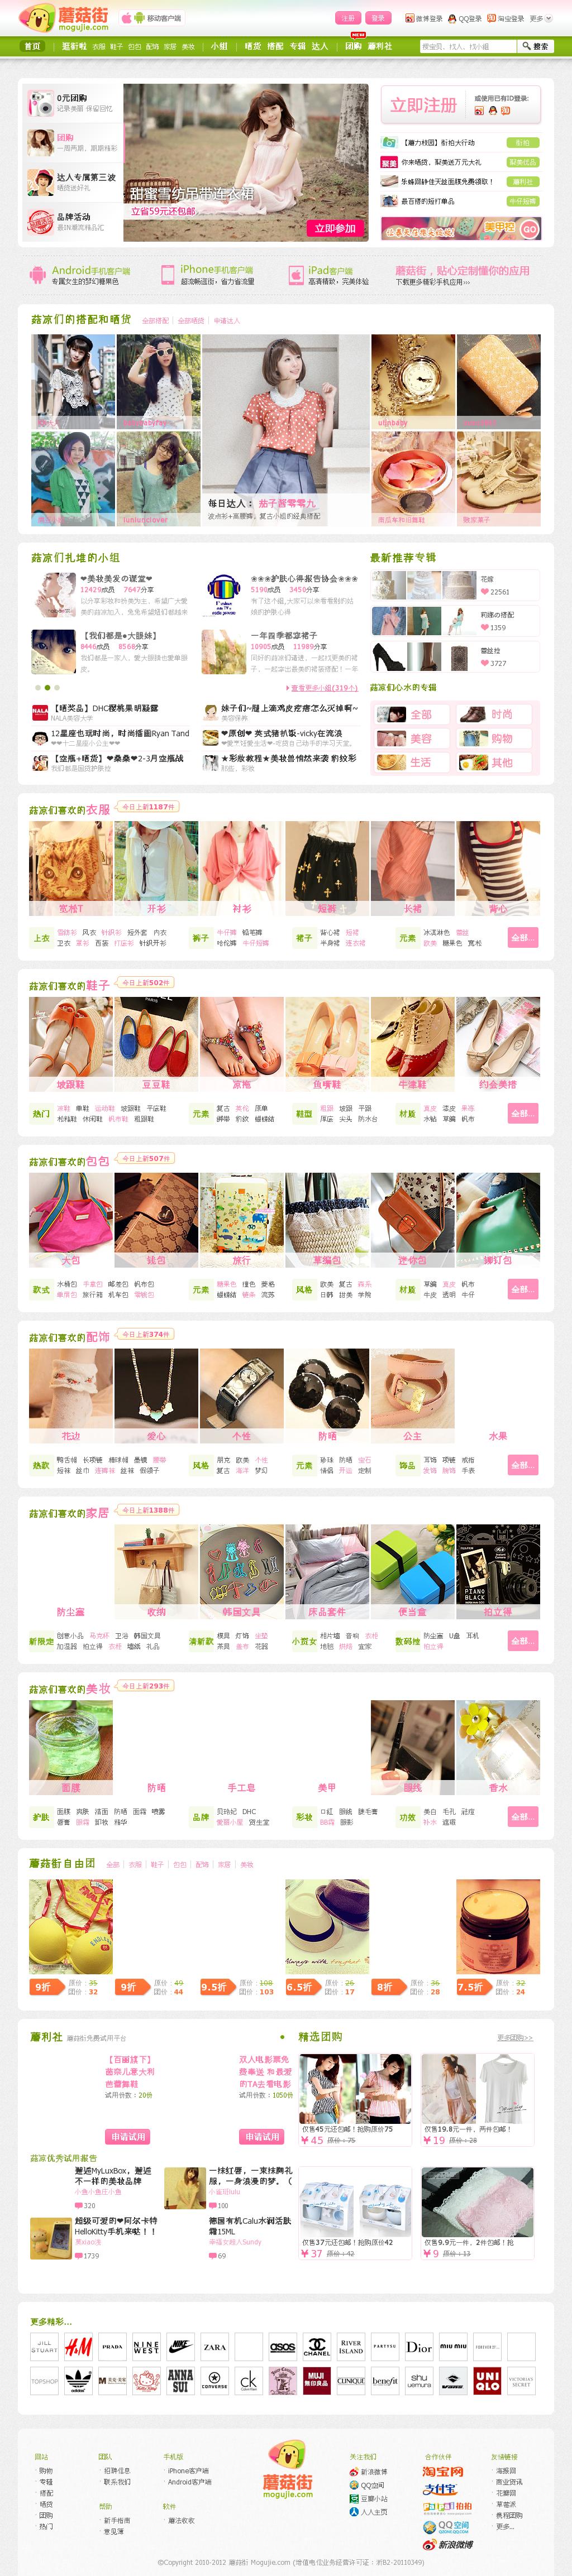 Chinese Pinterest Clone: Mogujie,